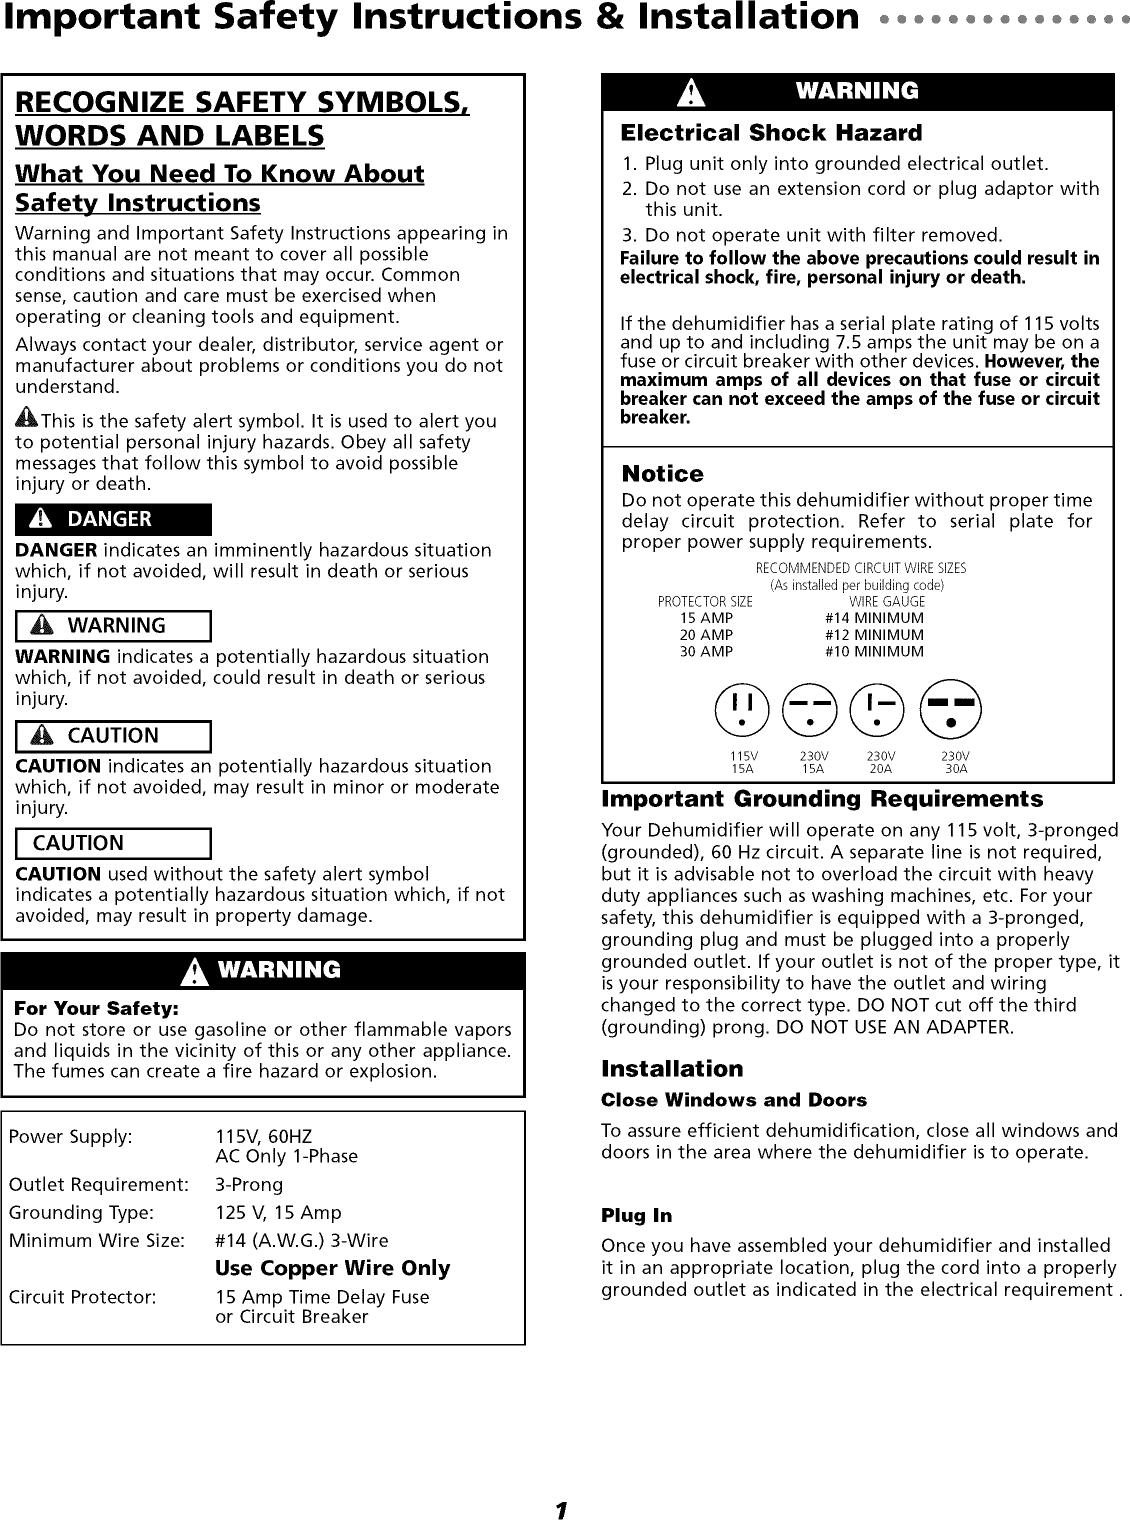 MAYTAG Dehumidifier Manual L0811394